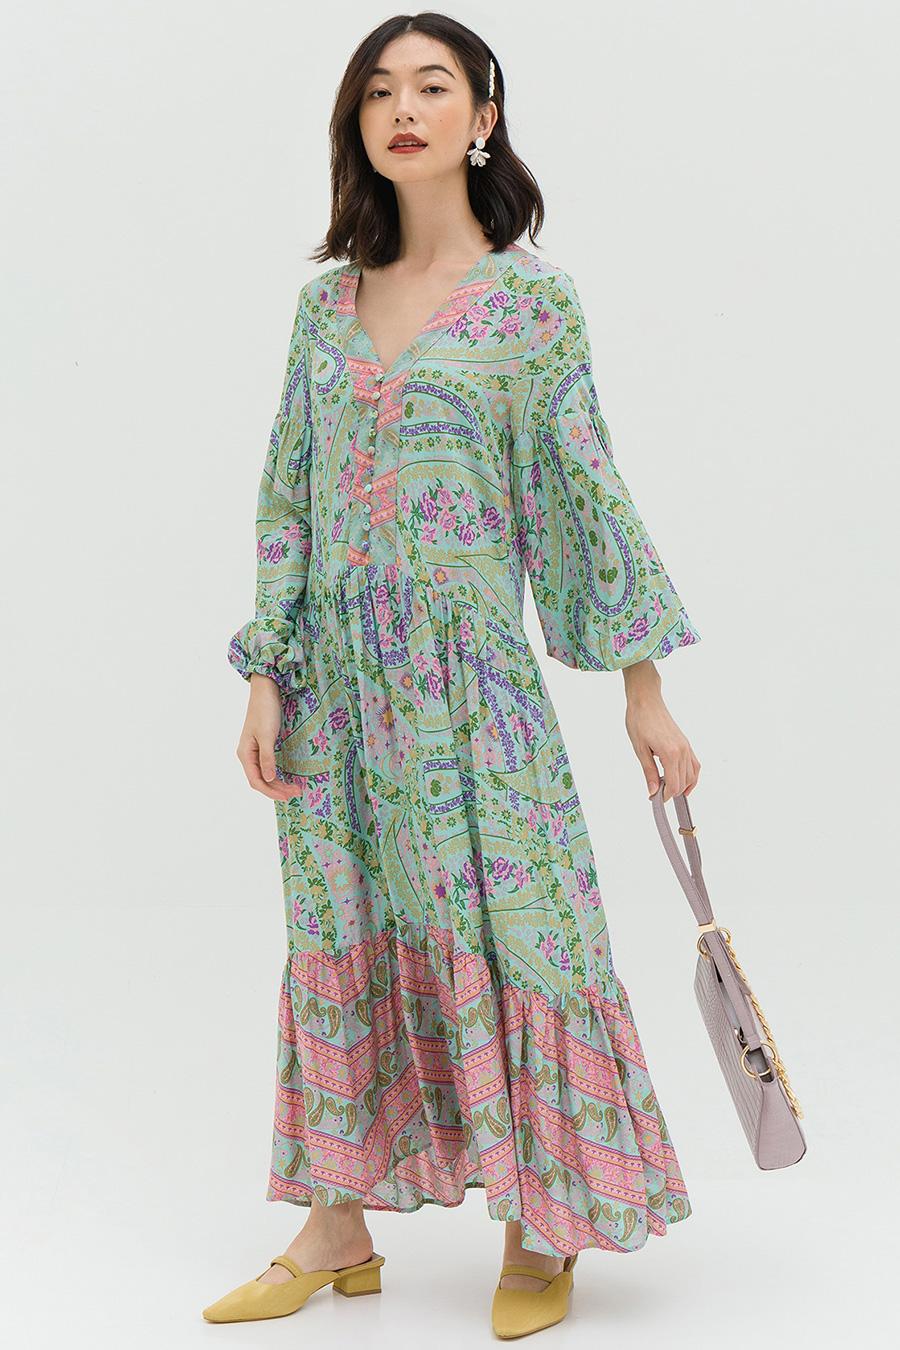 *BO* ANAIS DRESS - NYONA FLEUR